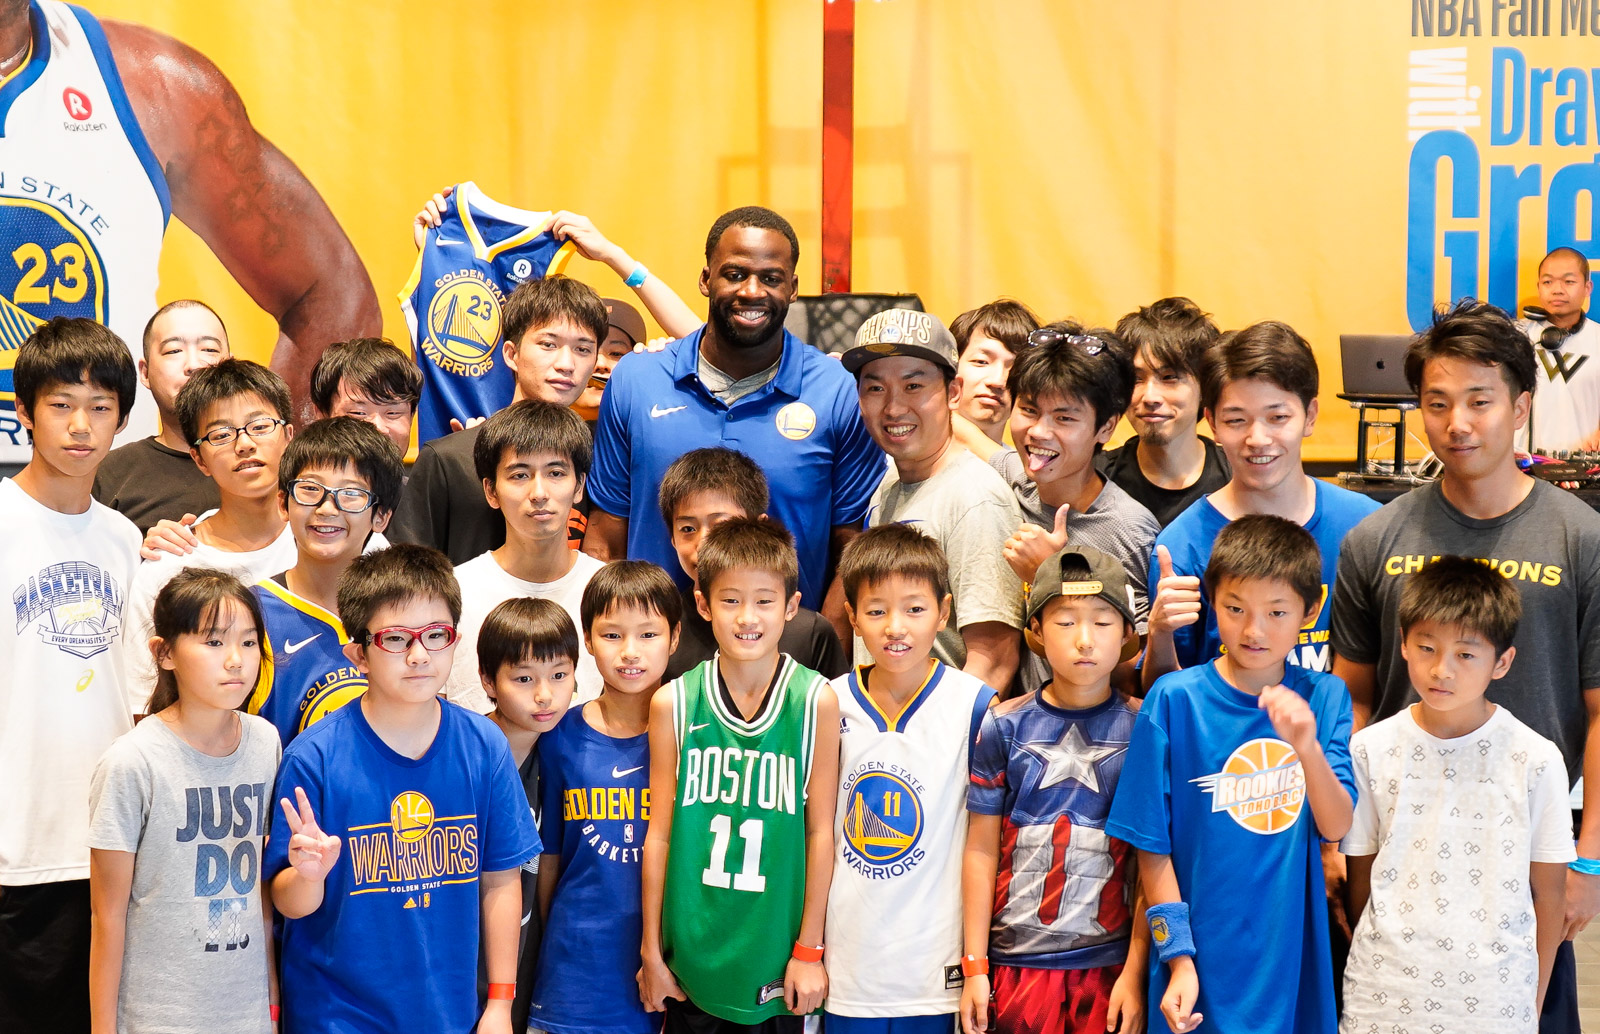 Rakuten welcomes NBA champion Draymond Green to Tokyo with fan event